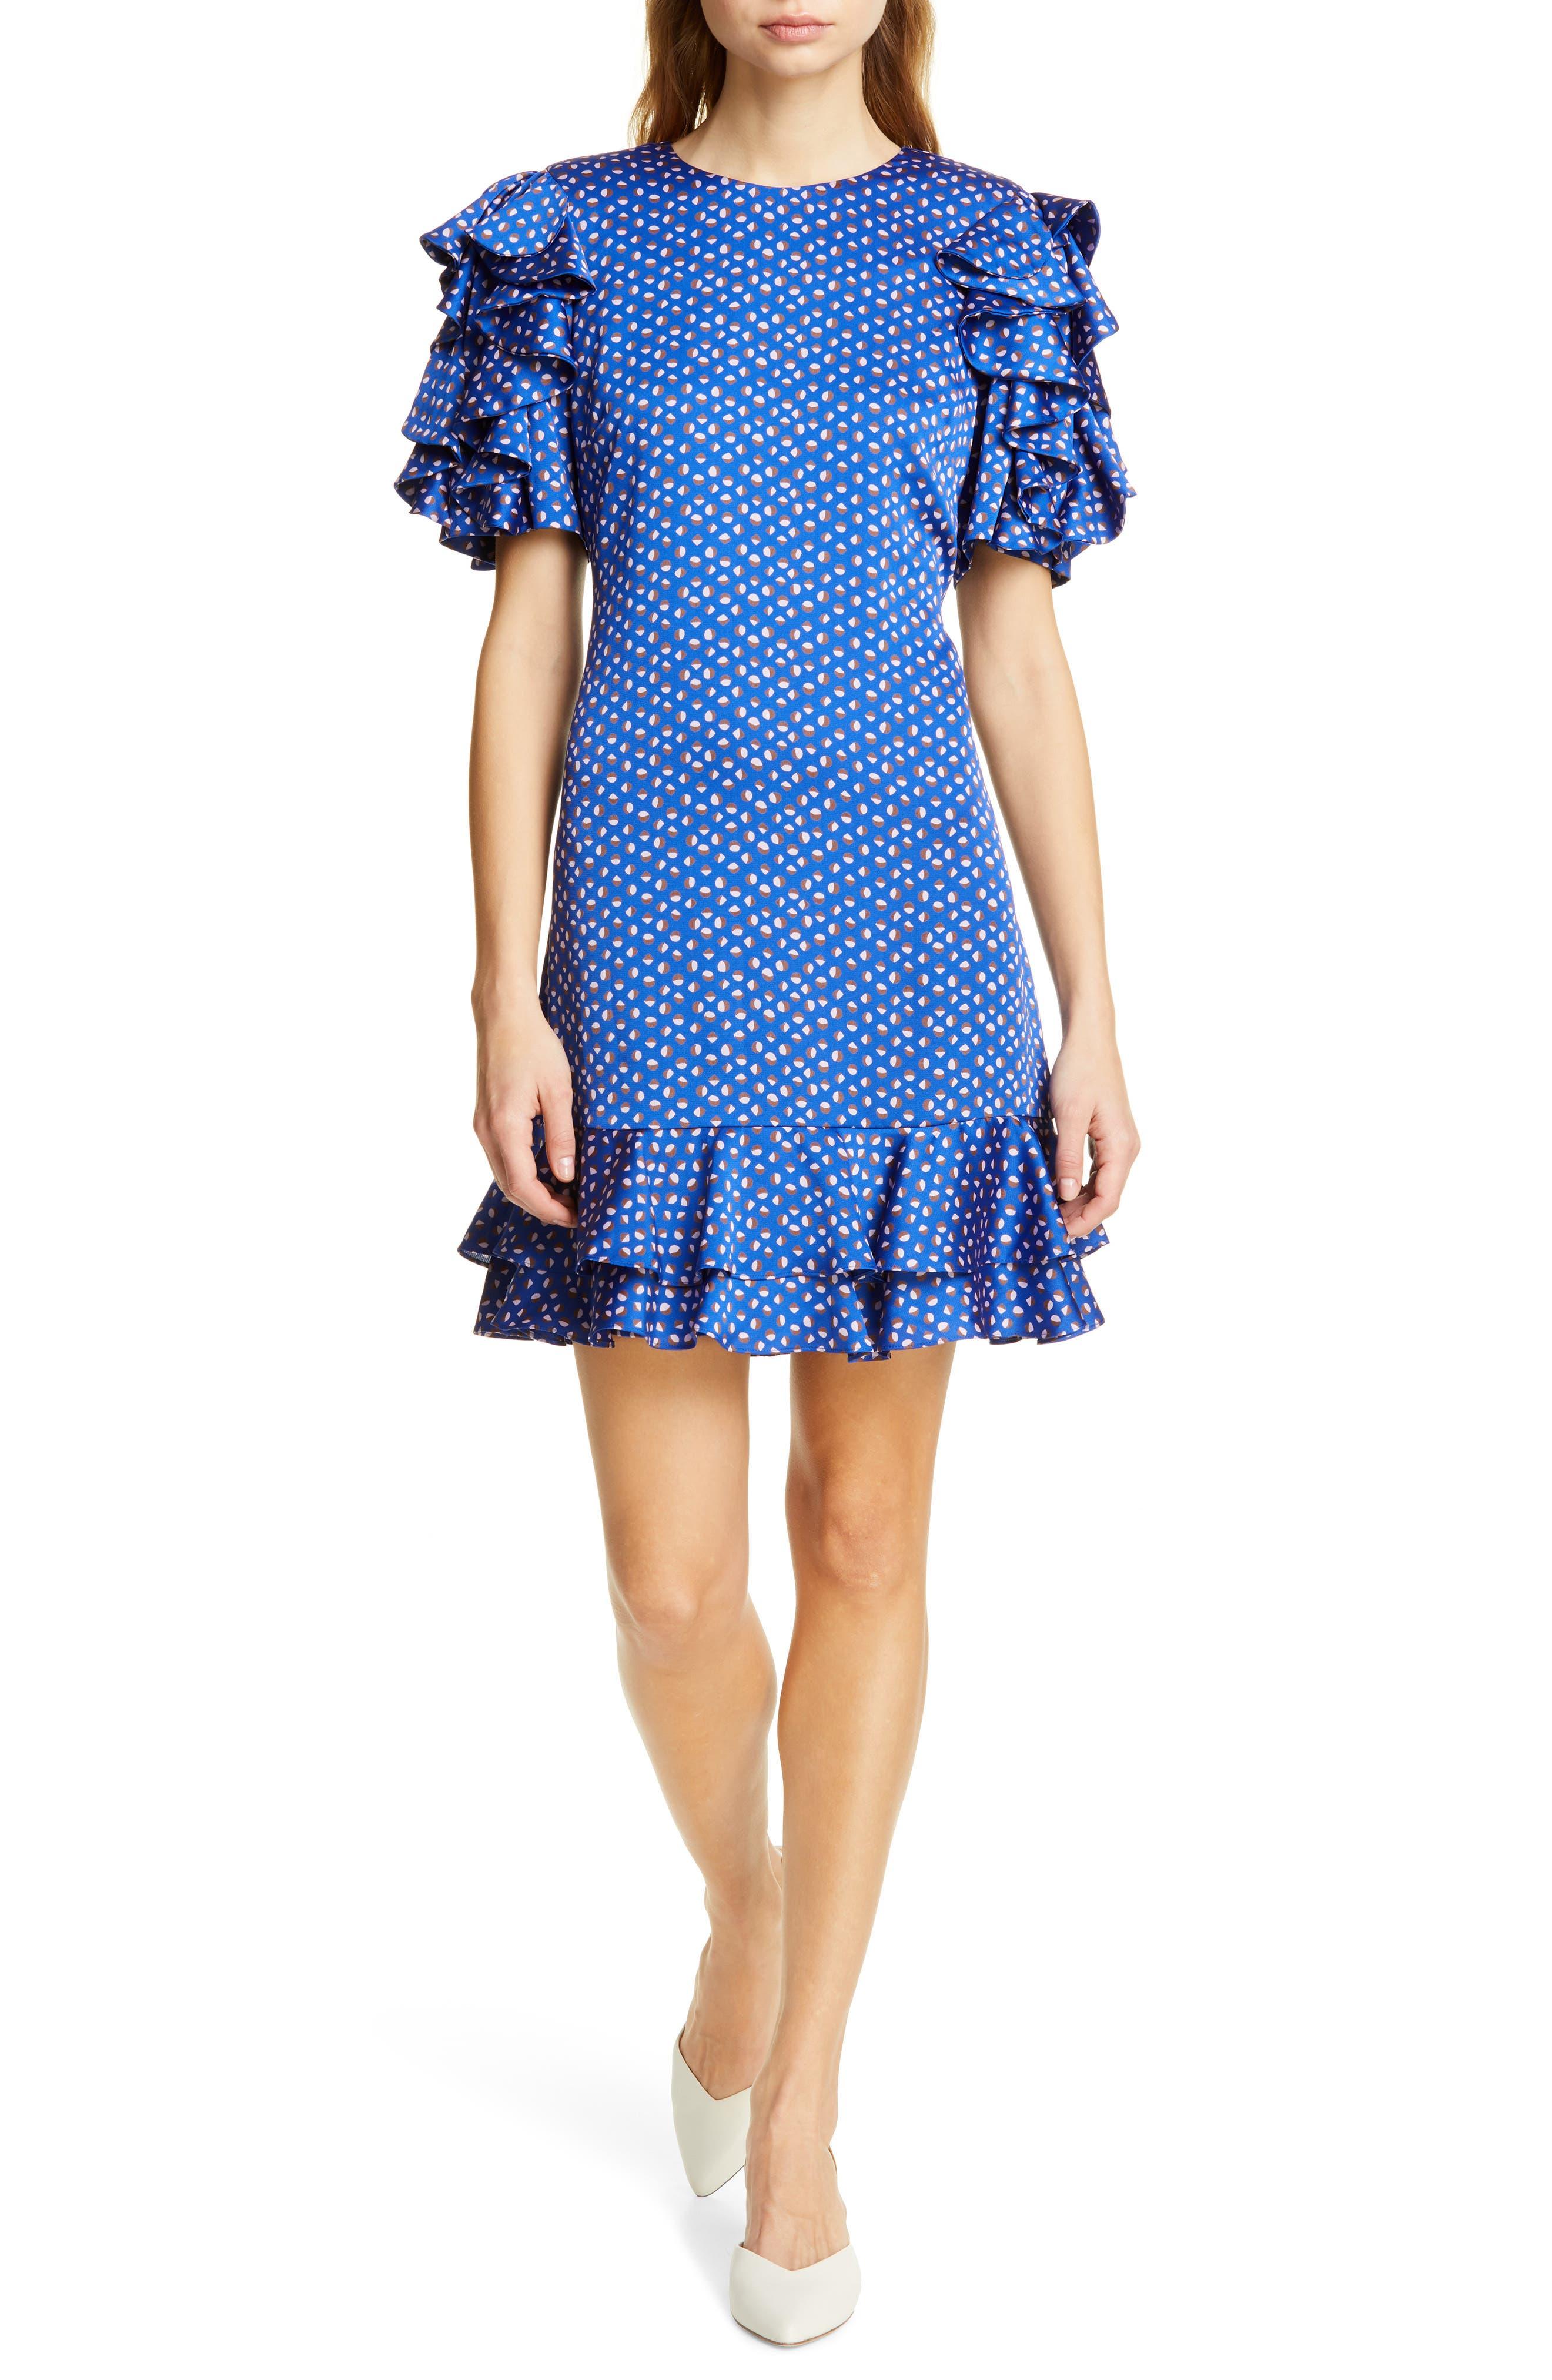 Kate Spade New York Geo Dot Satin Shift Dress, Blue